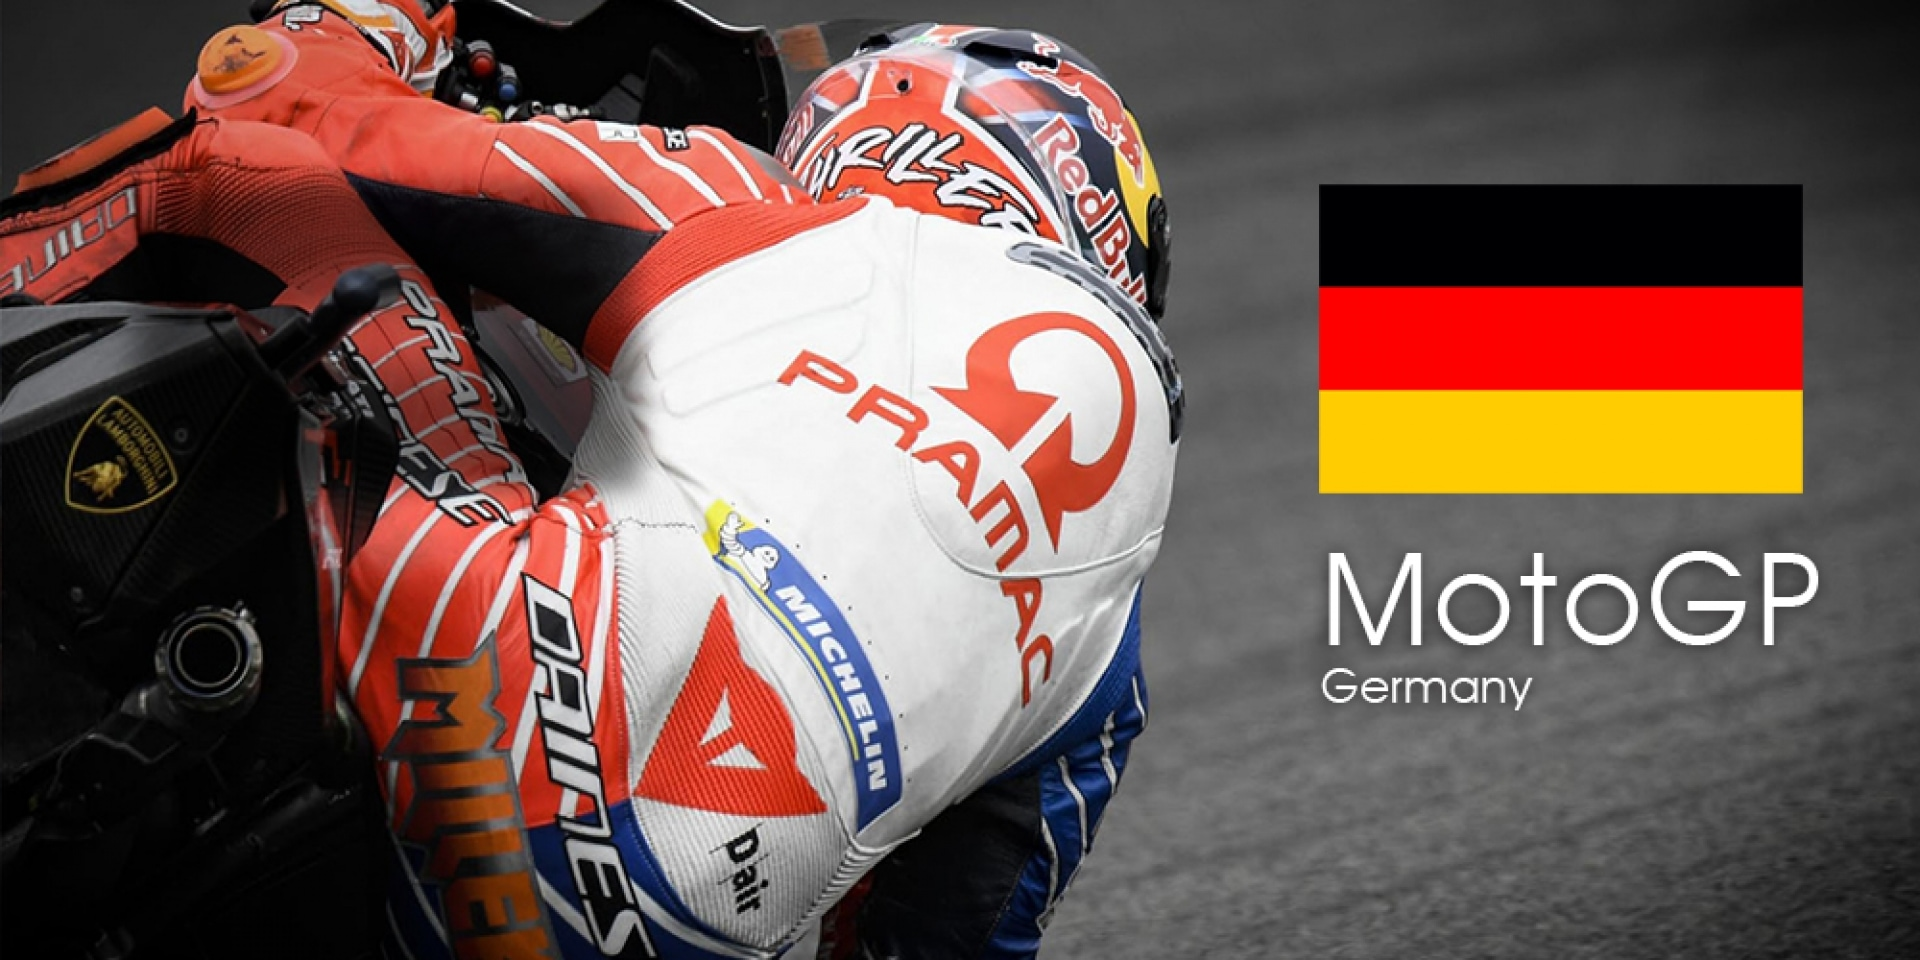 MotoGP 2019 德國站 轉播時間